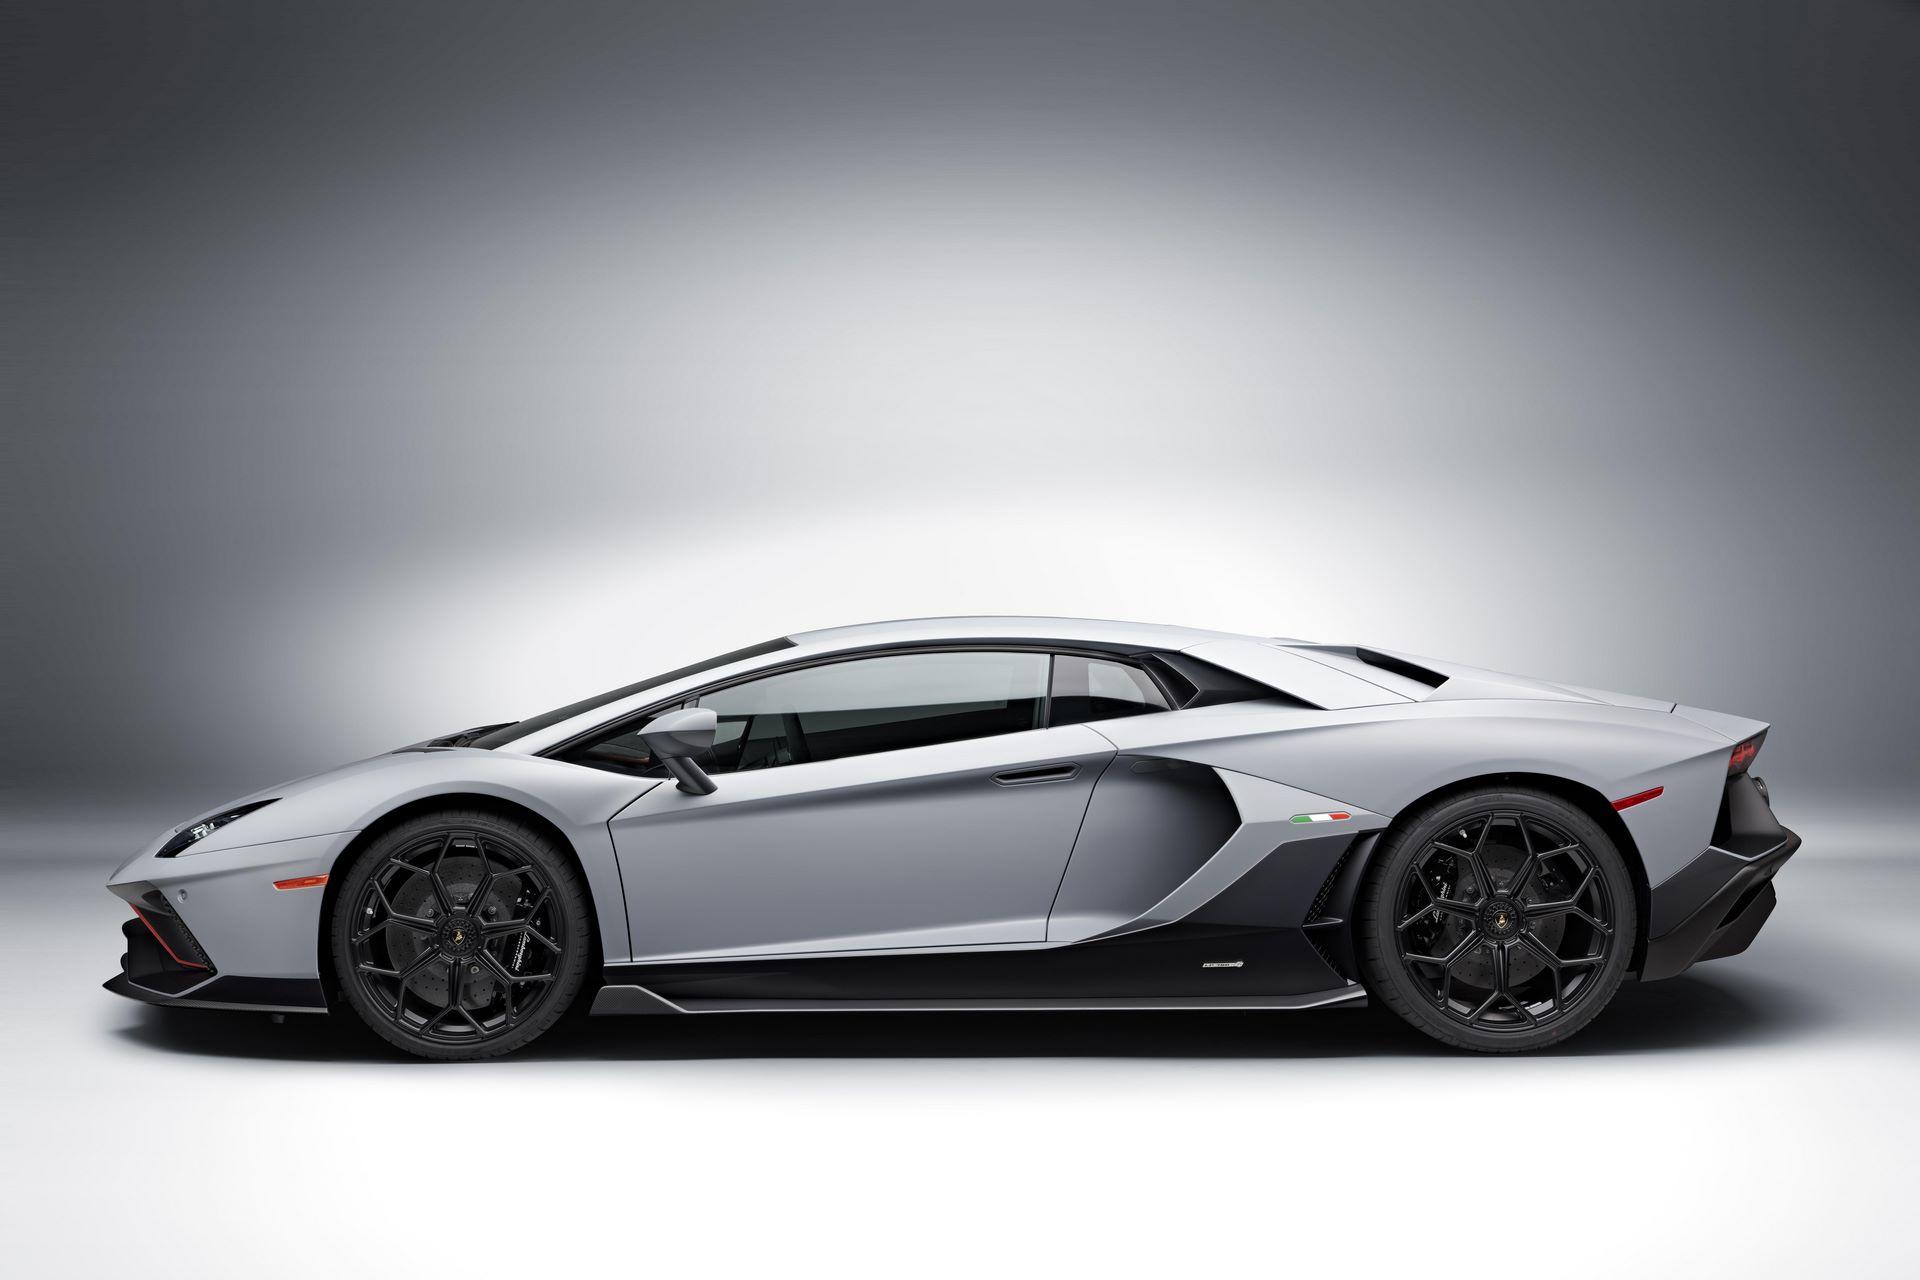 Lamborghini-Aventador-LP780-4-Ultimae-30